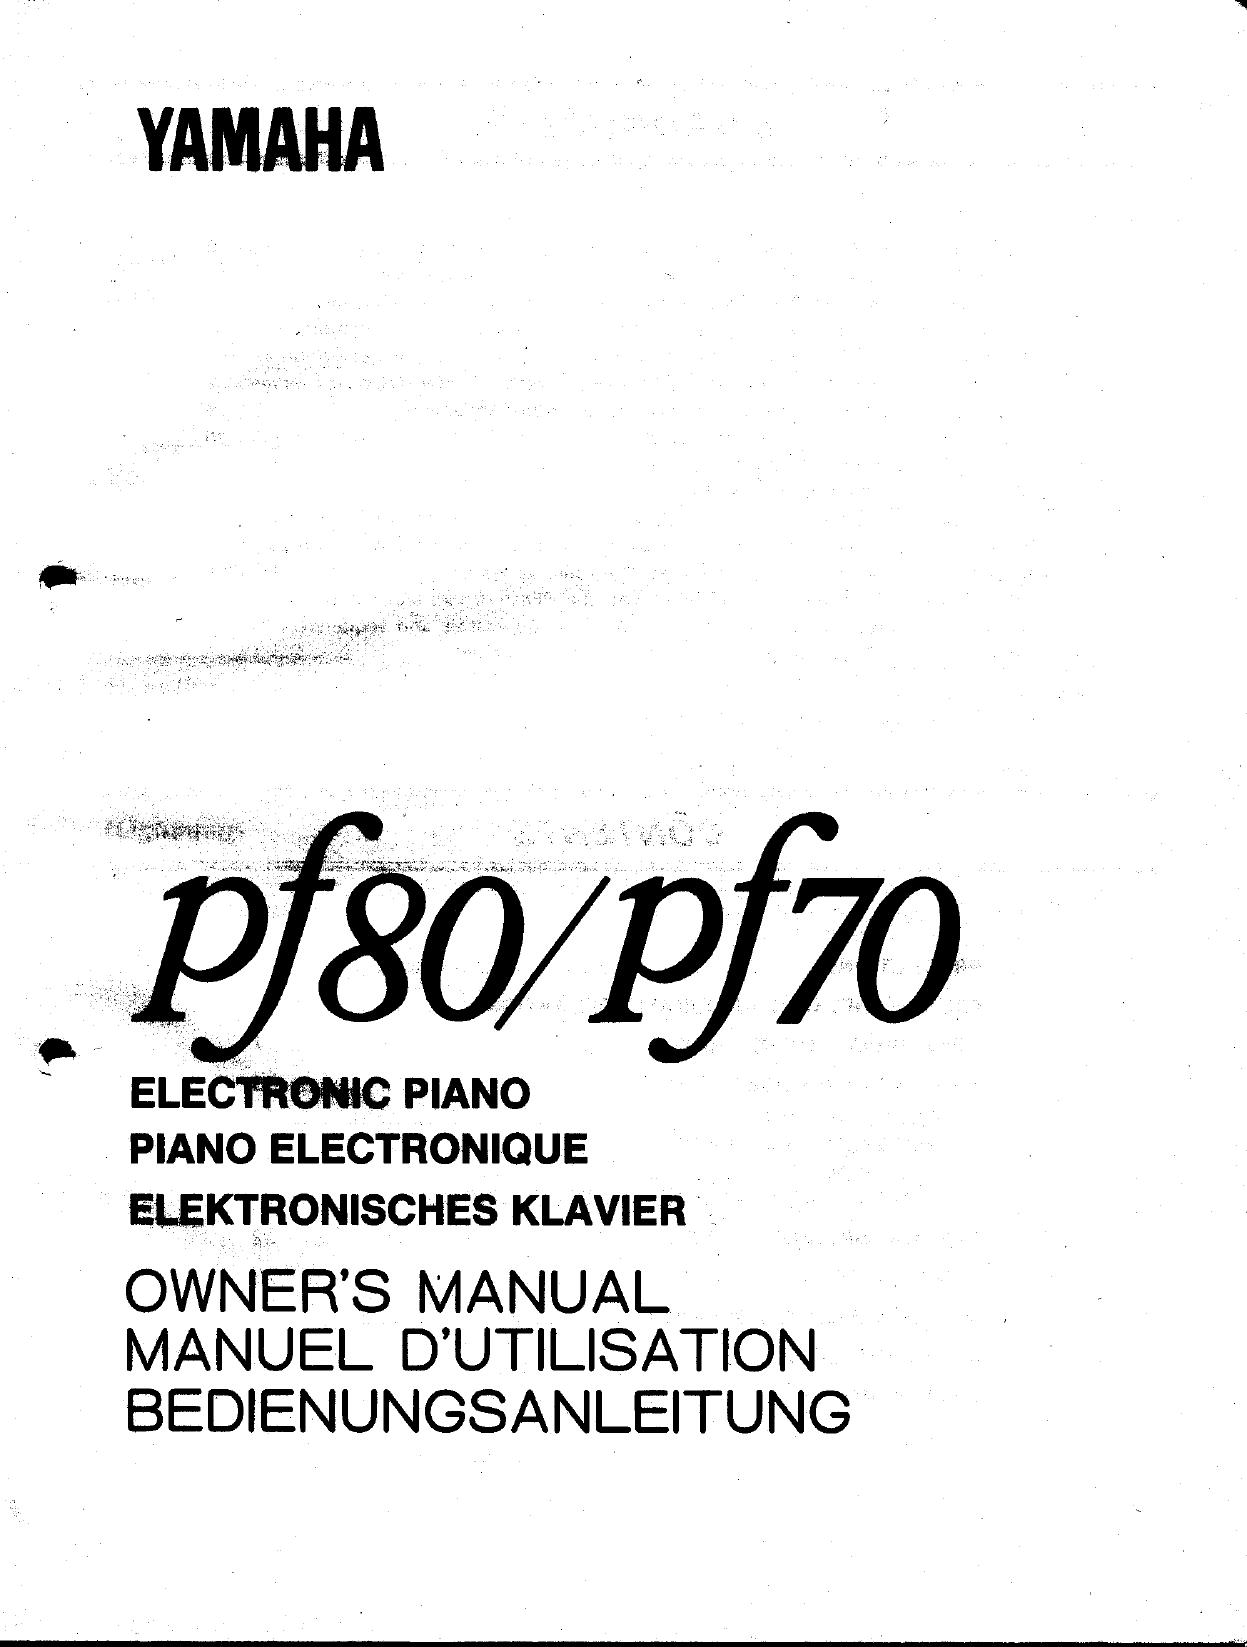 Yamaha Pf80/pf70 Owner's Manual (Image) PF80E